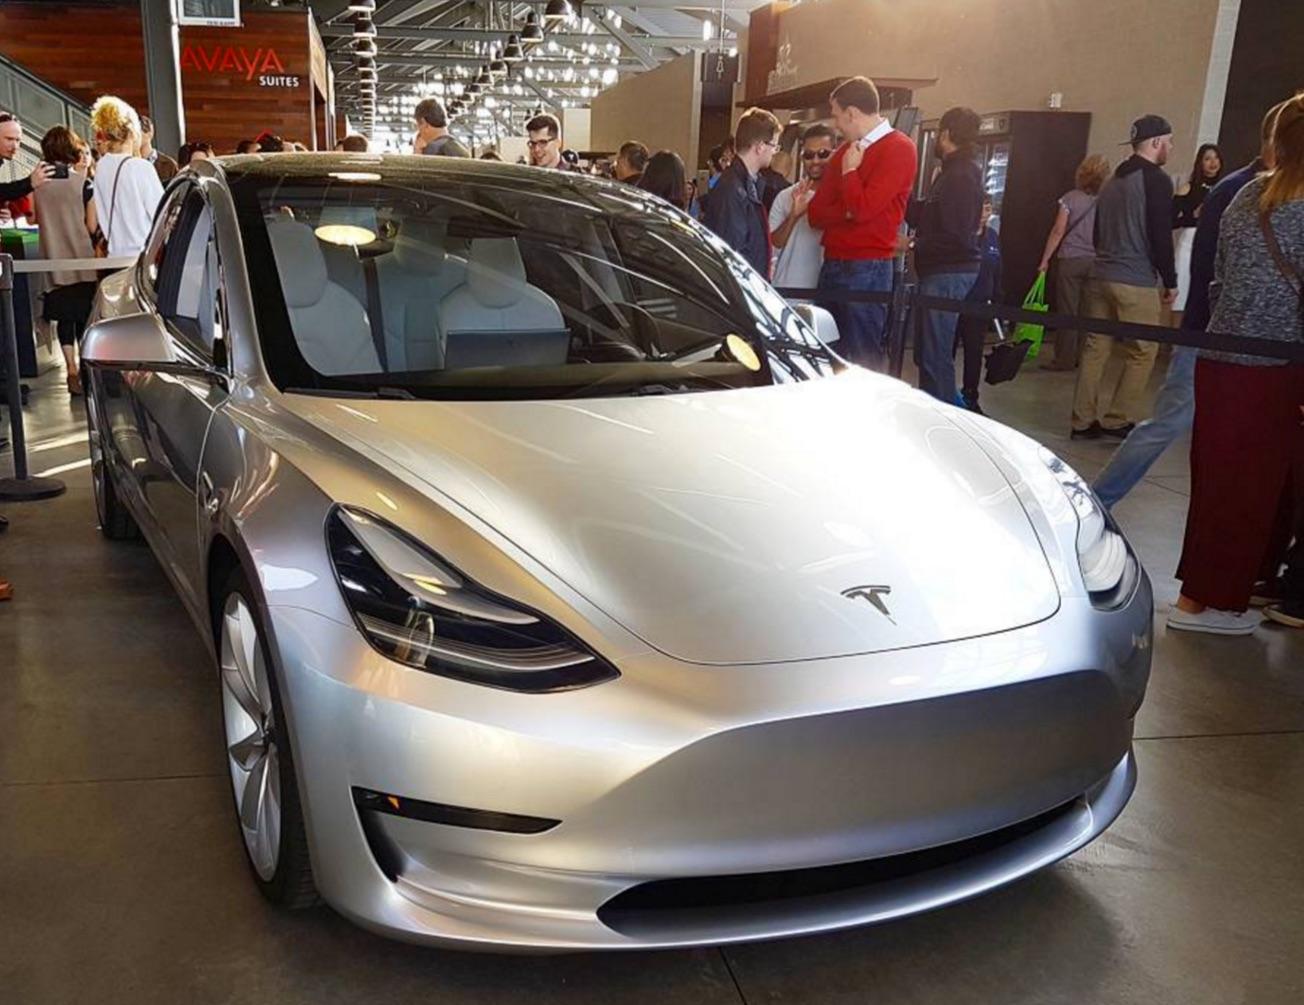 Silver Tesla Model 3 at the Avaya Stadium, Nov 5, 2016